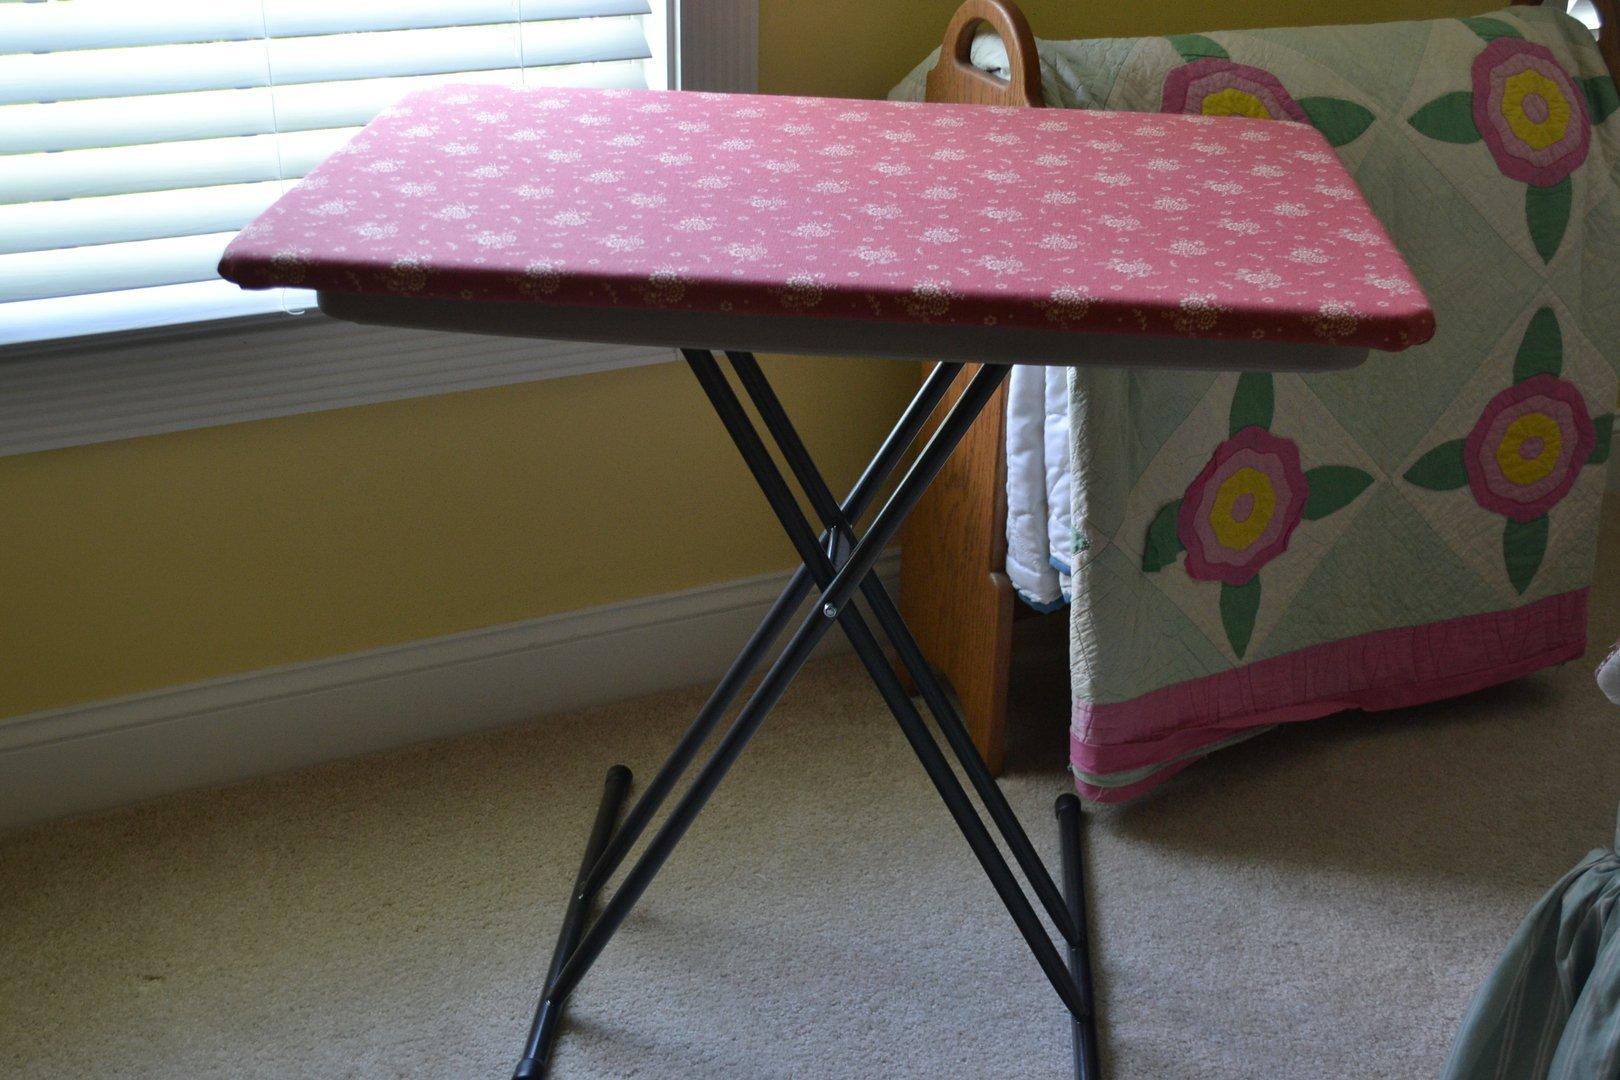 N- TNT Studio Table Ironing Board 21.5 x 32